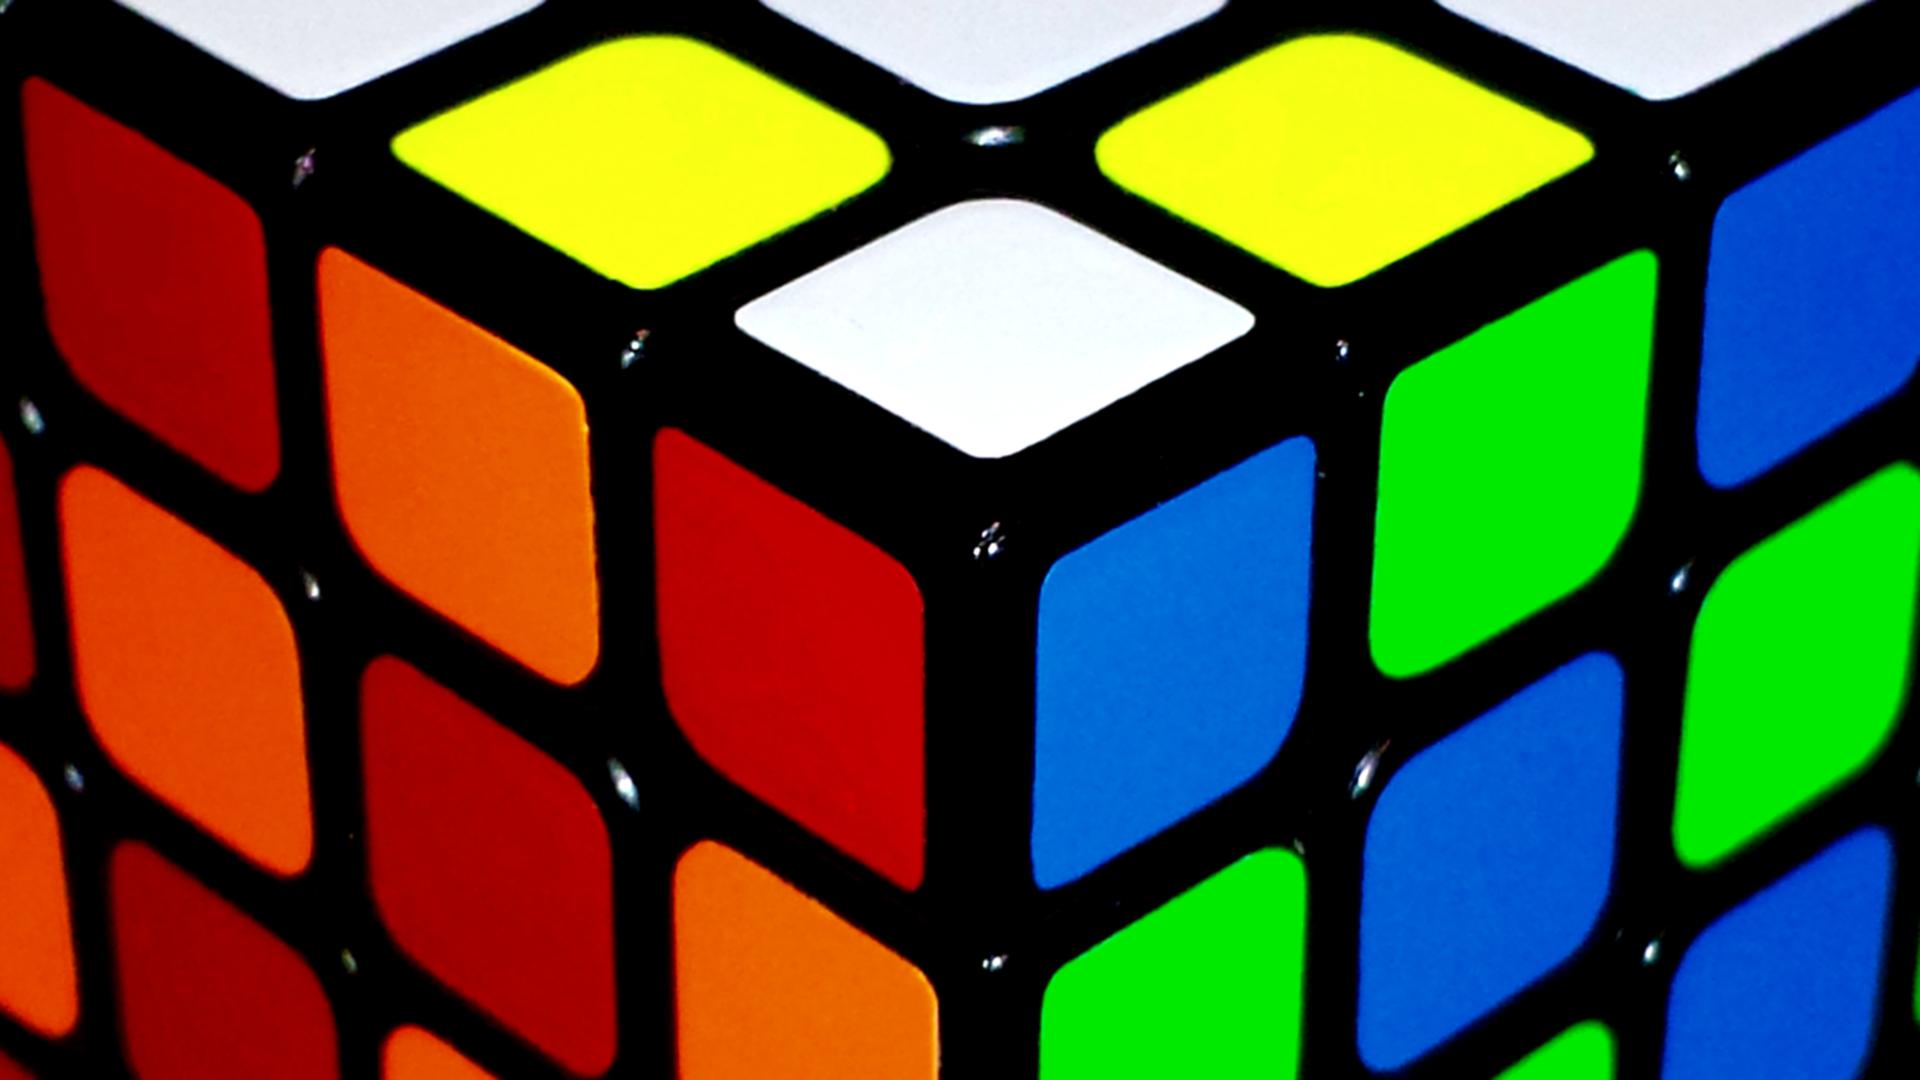 rubiks cube up close wallpaper 62756